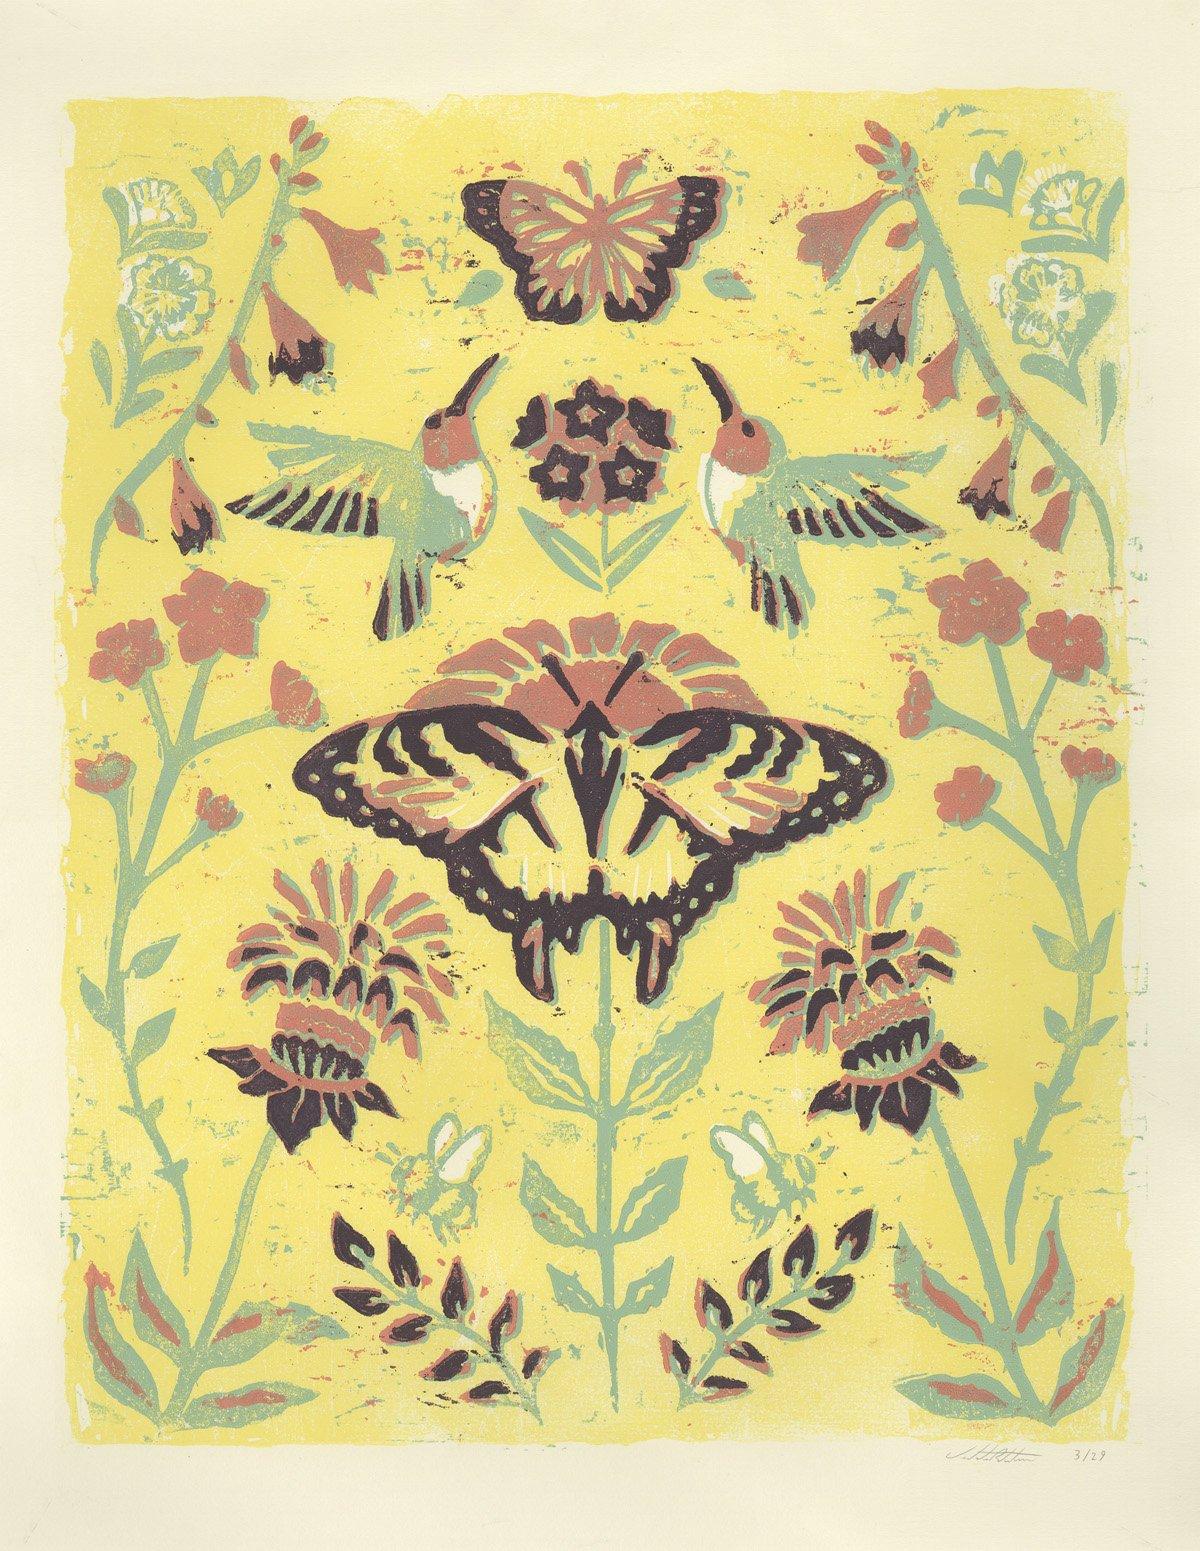 The Pollinator's Garden poster by Violeta Rotstein